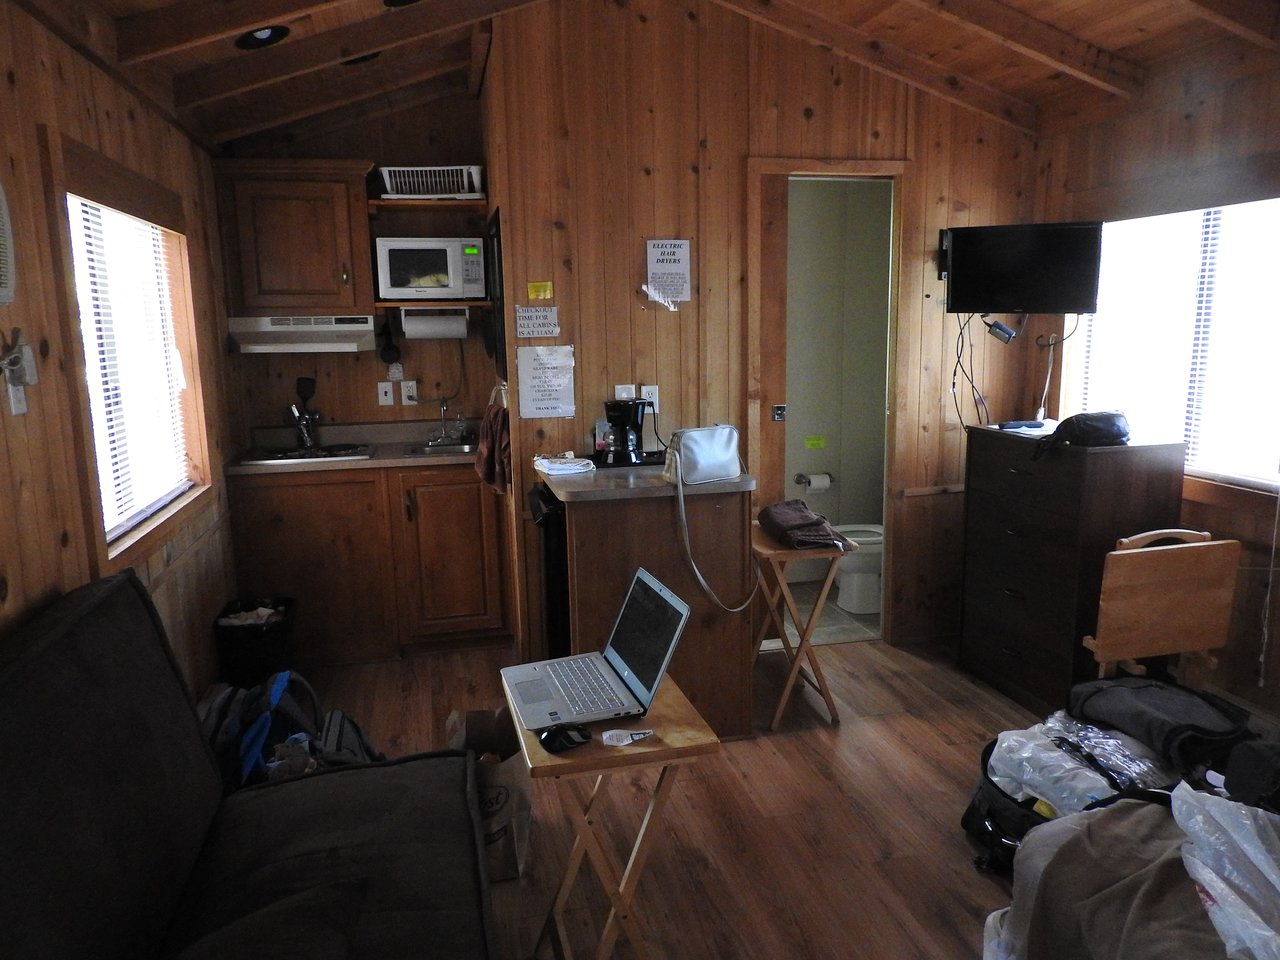 Dean Creek Resort Prices Campground Reviews Redway Ca Tripadvisor